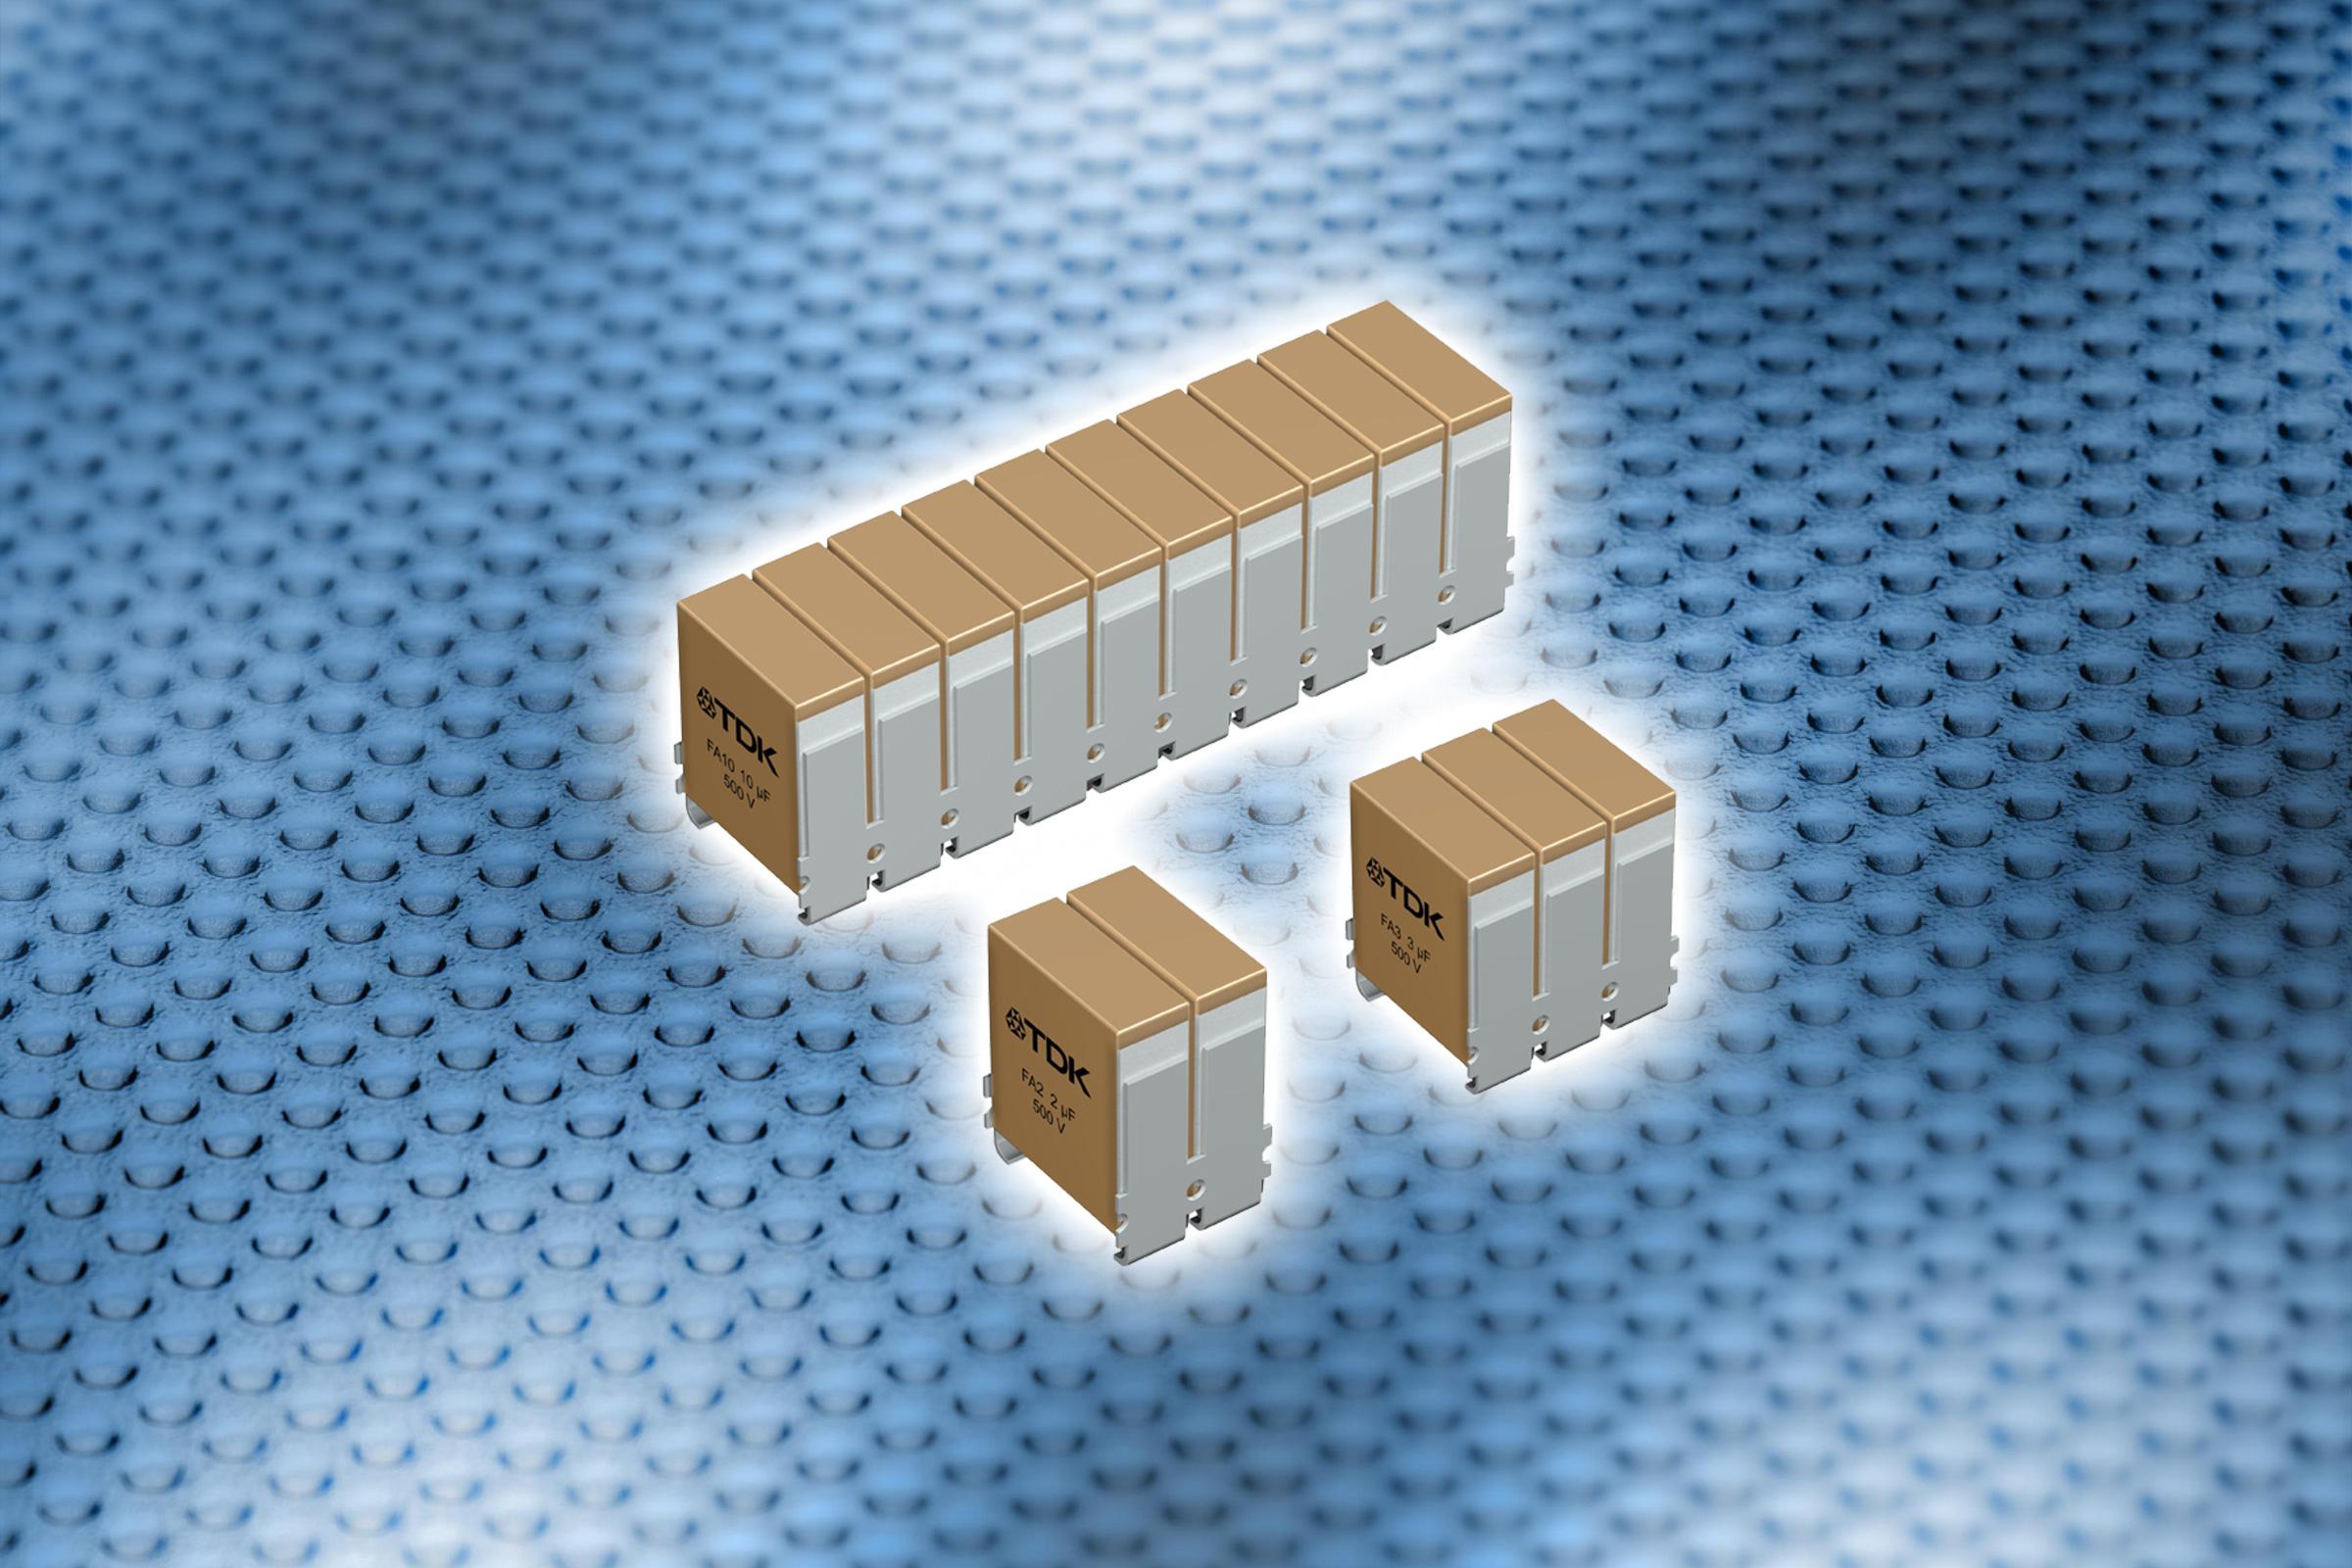 Keramikkondensatoren, kondensator, kondensatoren, keramik-kondensatoren, epi-components-trade-gmbh, tdk-keramikkondensator